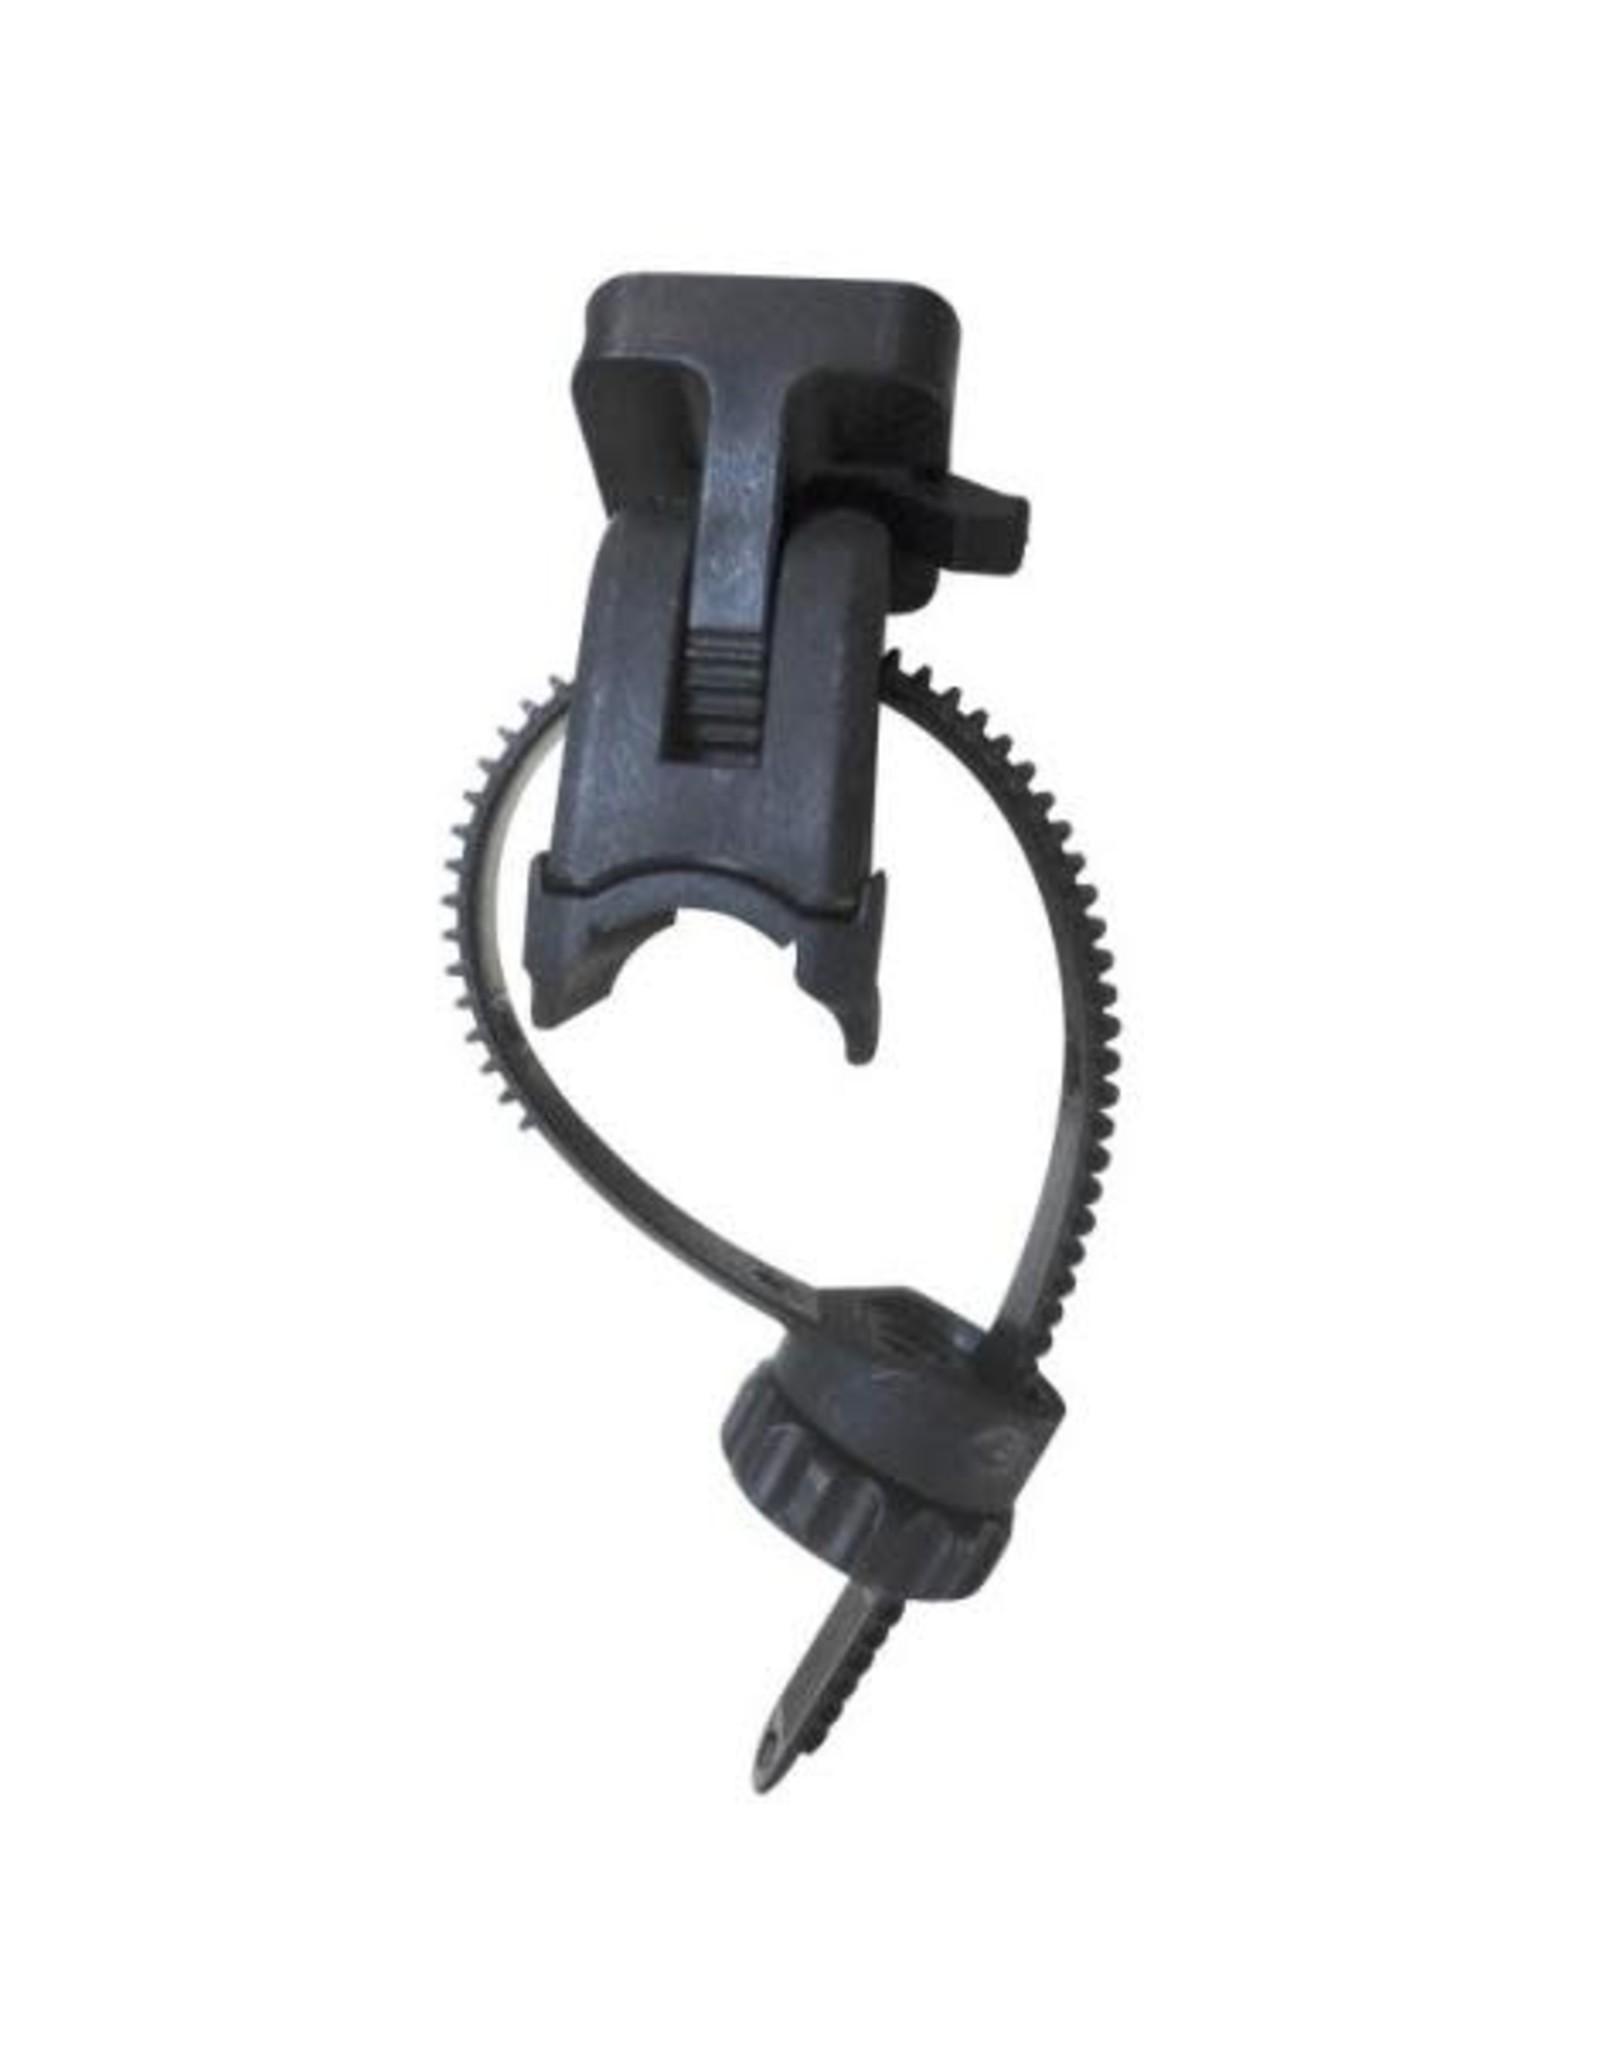 Cateye Light Bracket SP11 Flex Tight 18-34m